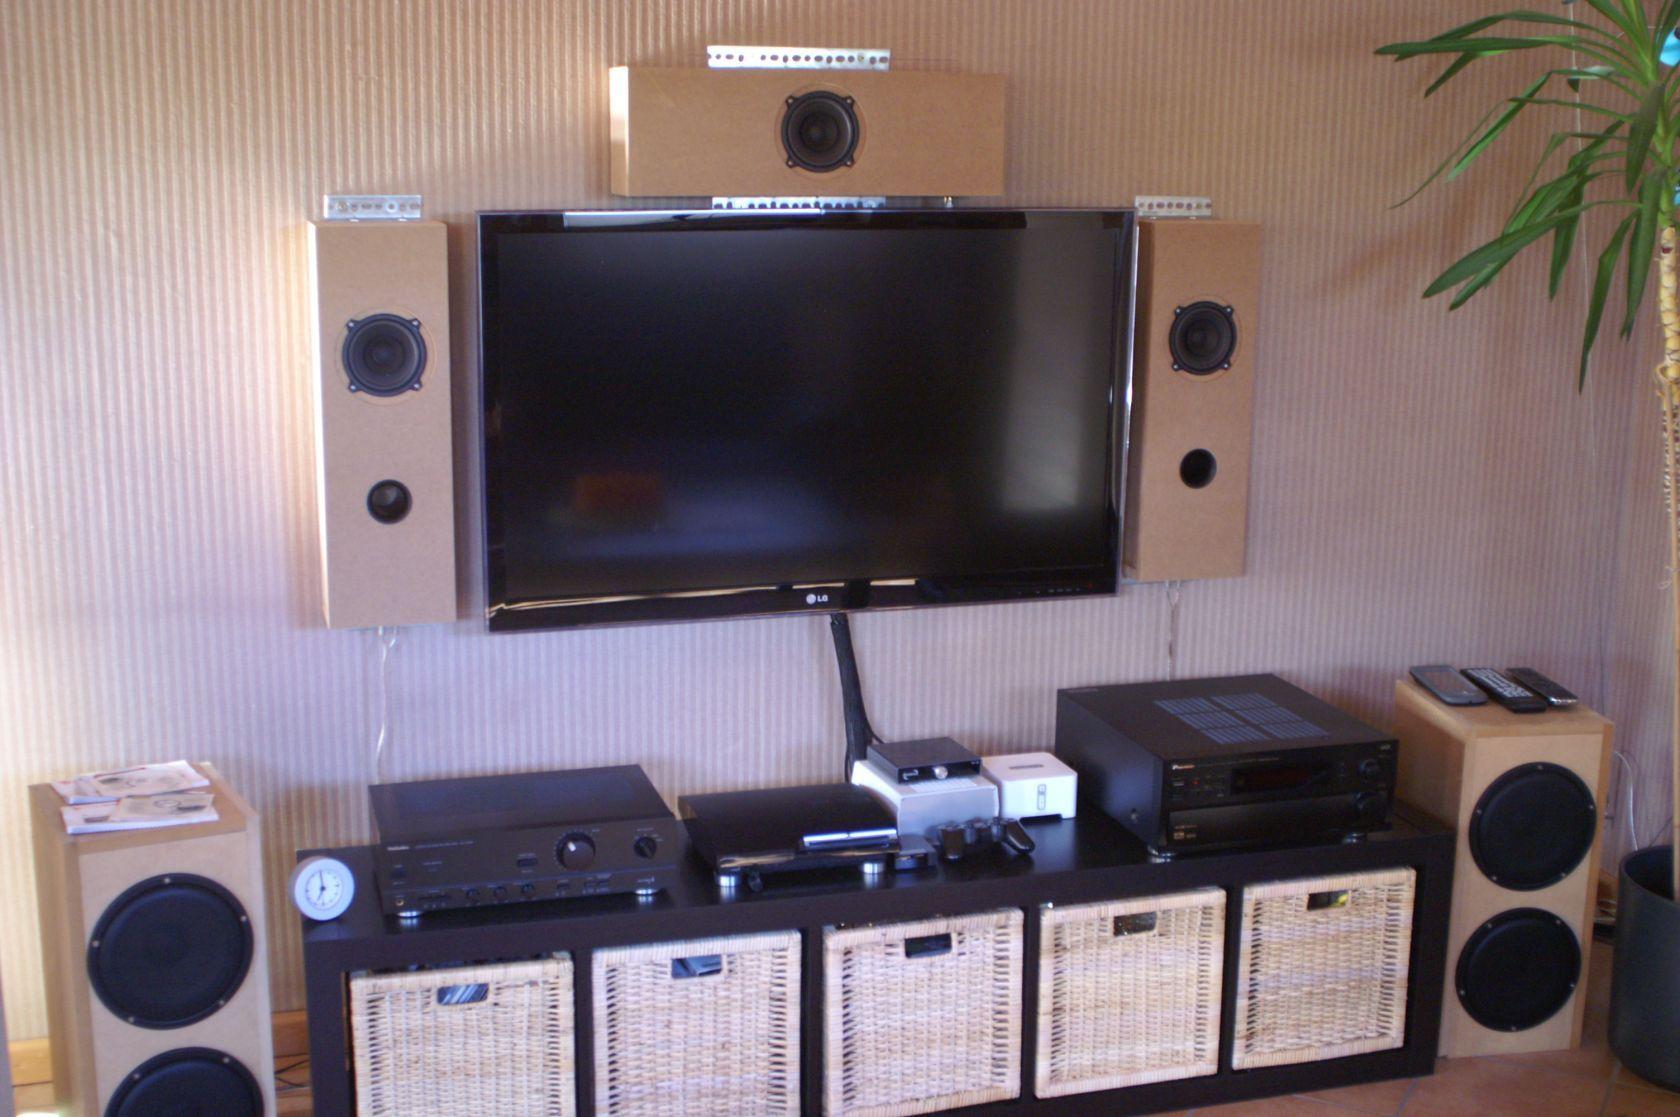 fernseher wand h he 8k hdr10 suhd qled wer blickt bei. Black Bedroom Furniture Sets. Home Design Ideas